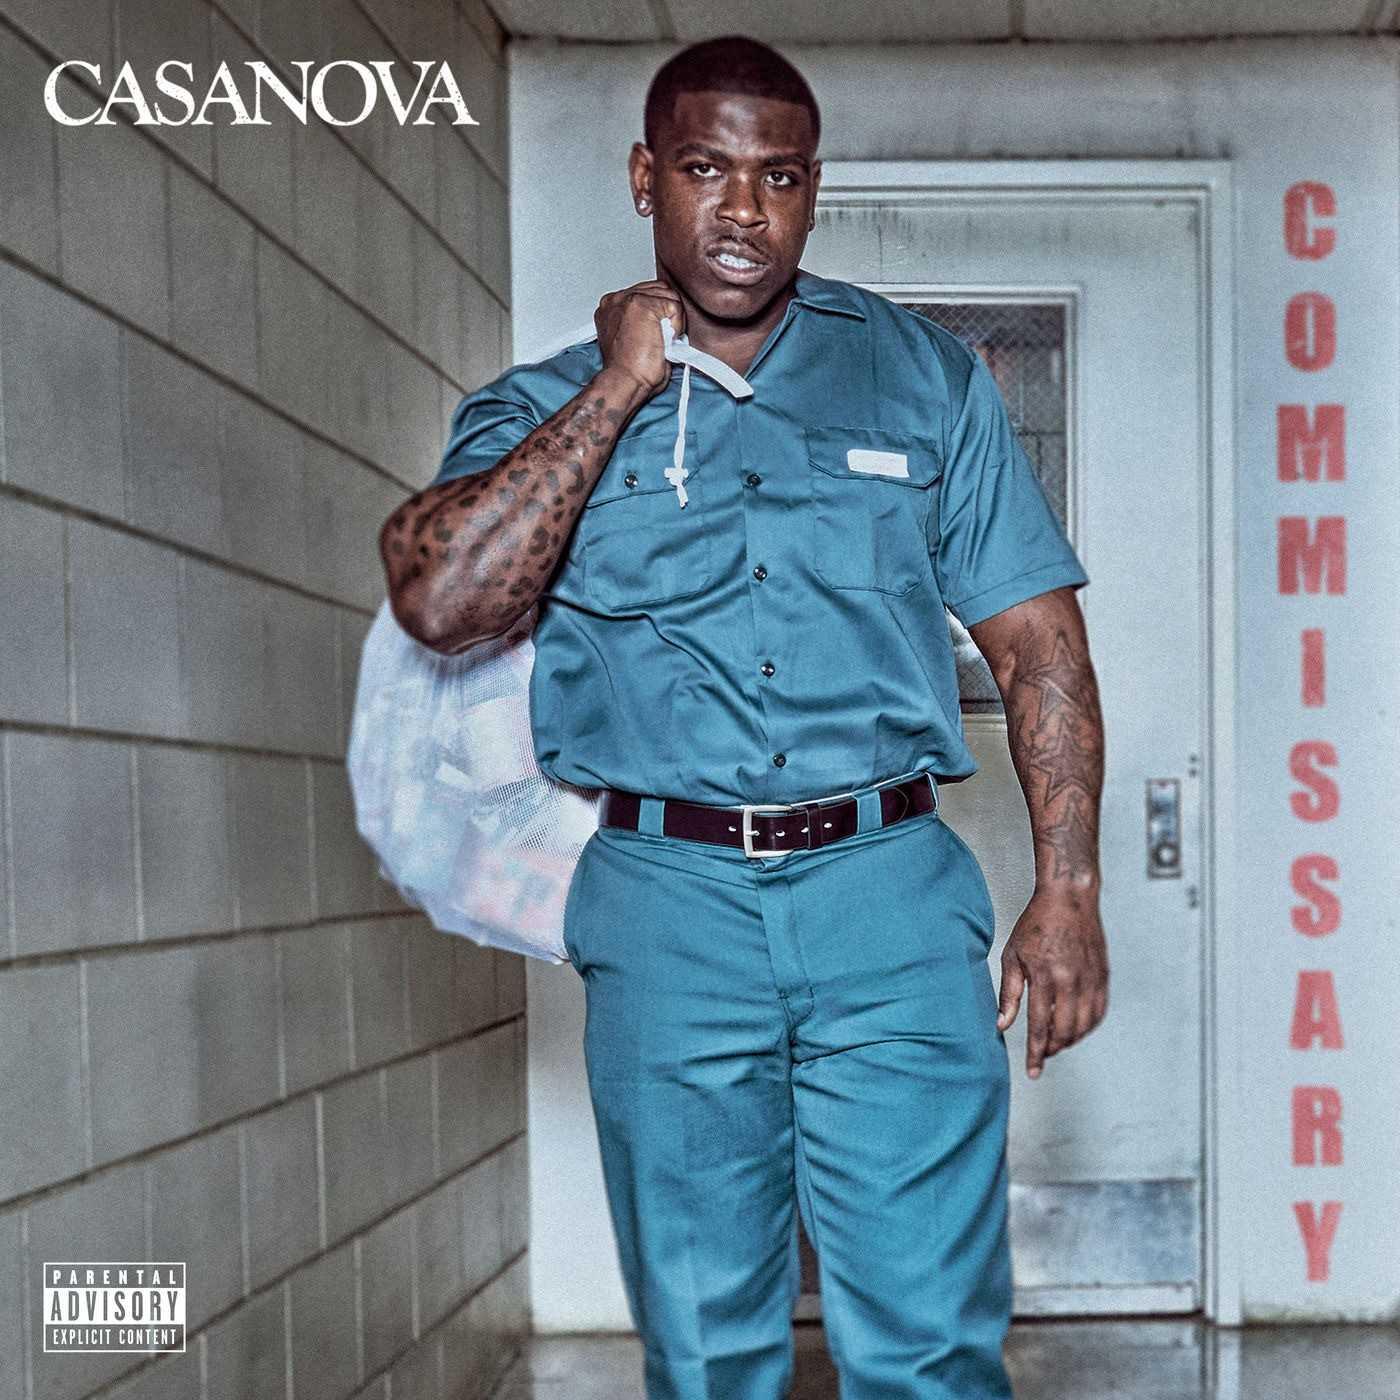 New Music: Casanova Ft. A Boogie Wit Da Hoodie   Down B#tch [Audio]